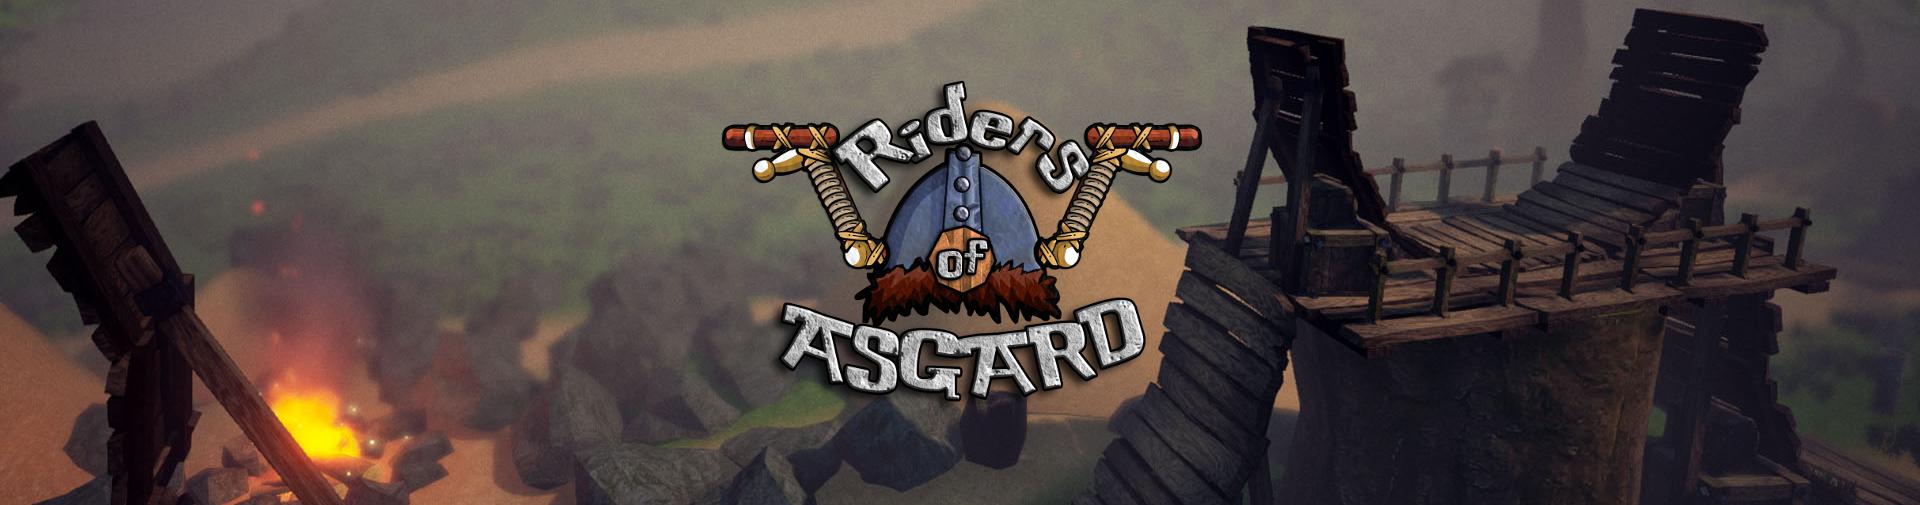 Riders of Asgard